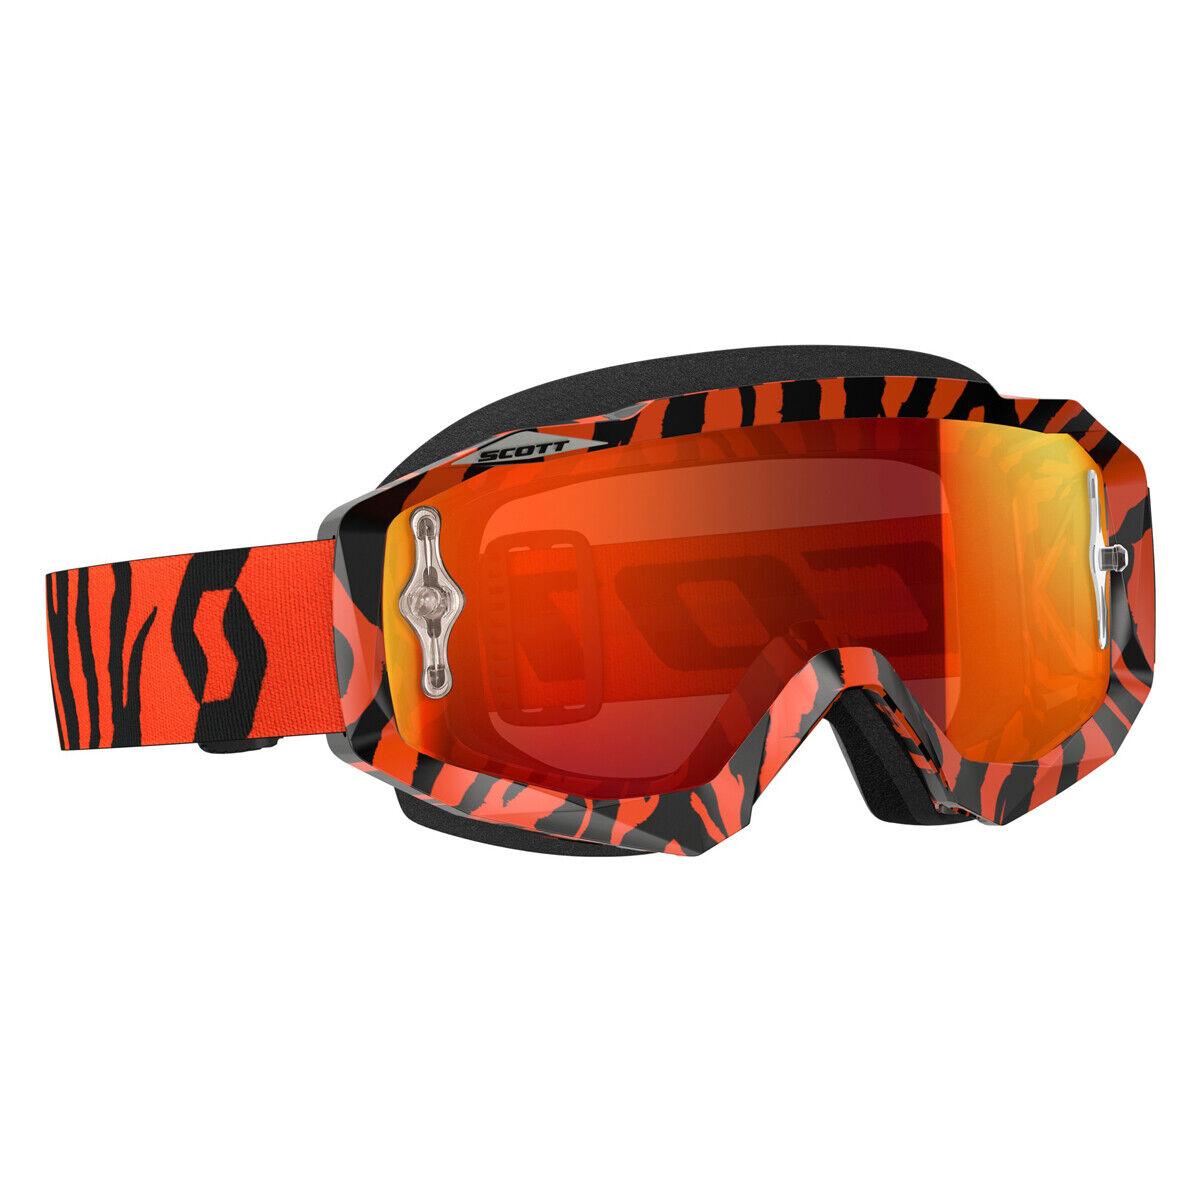 Scott Hustle MX Goggle Cross MTB Brille Orange schwarz Orange chrom works  | Bevorzugtes Material